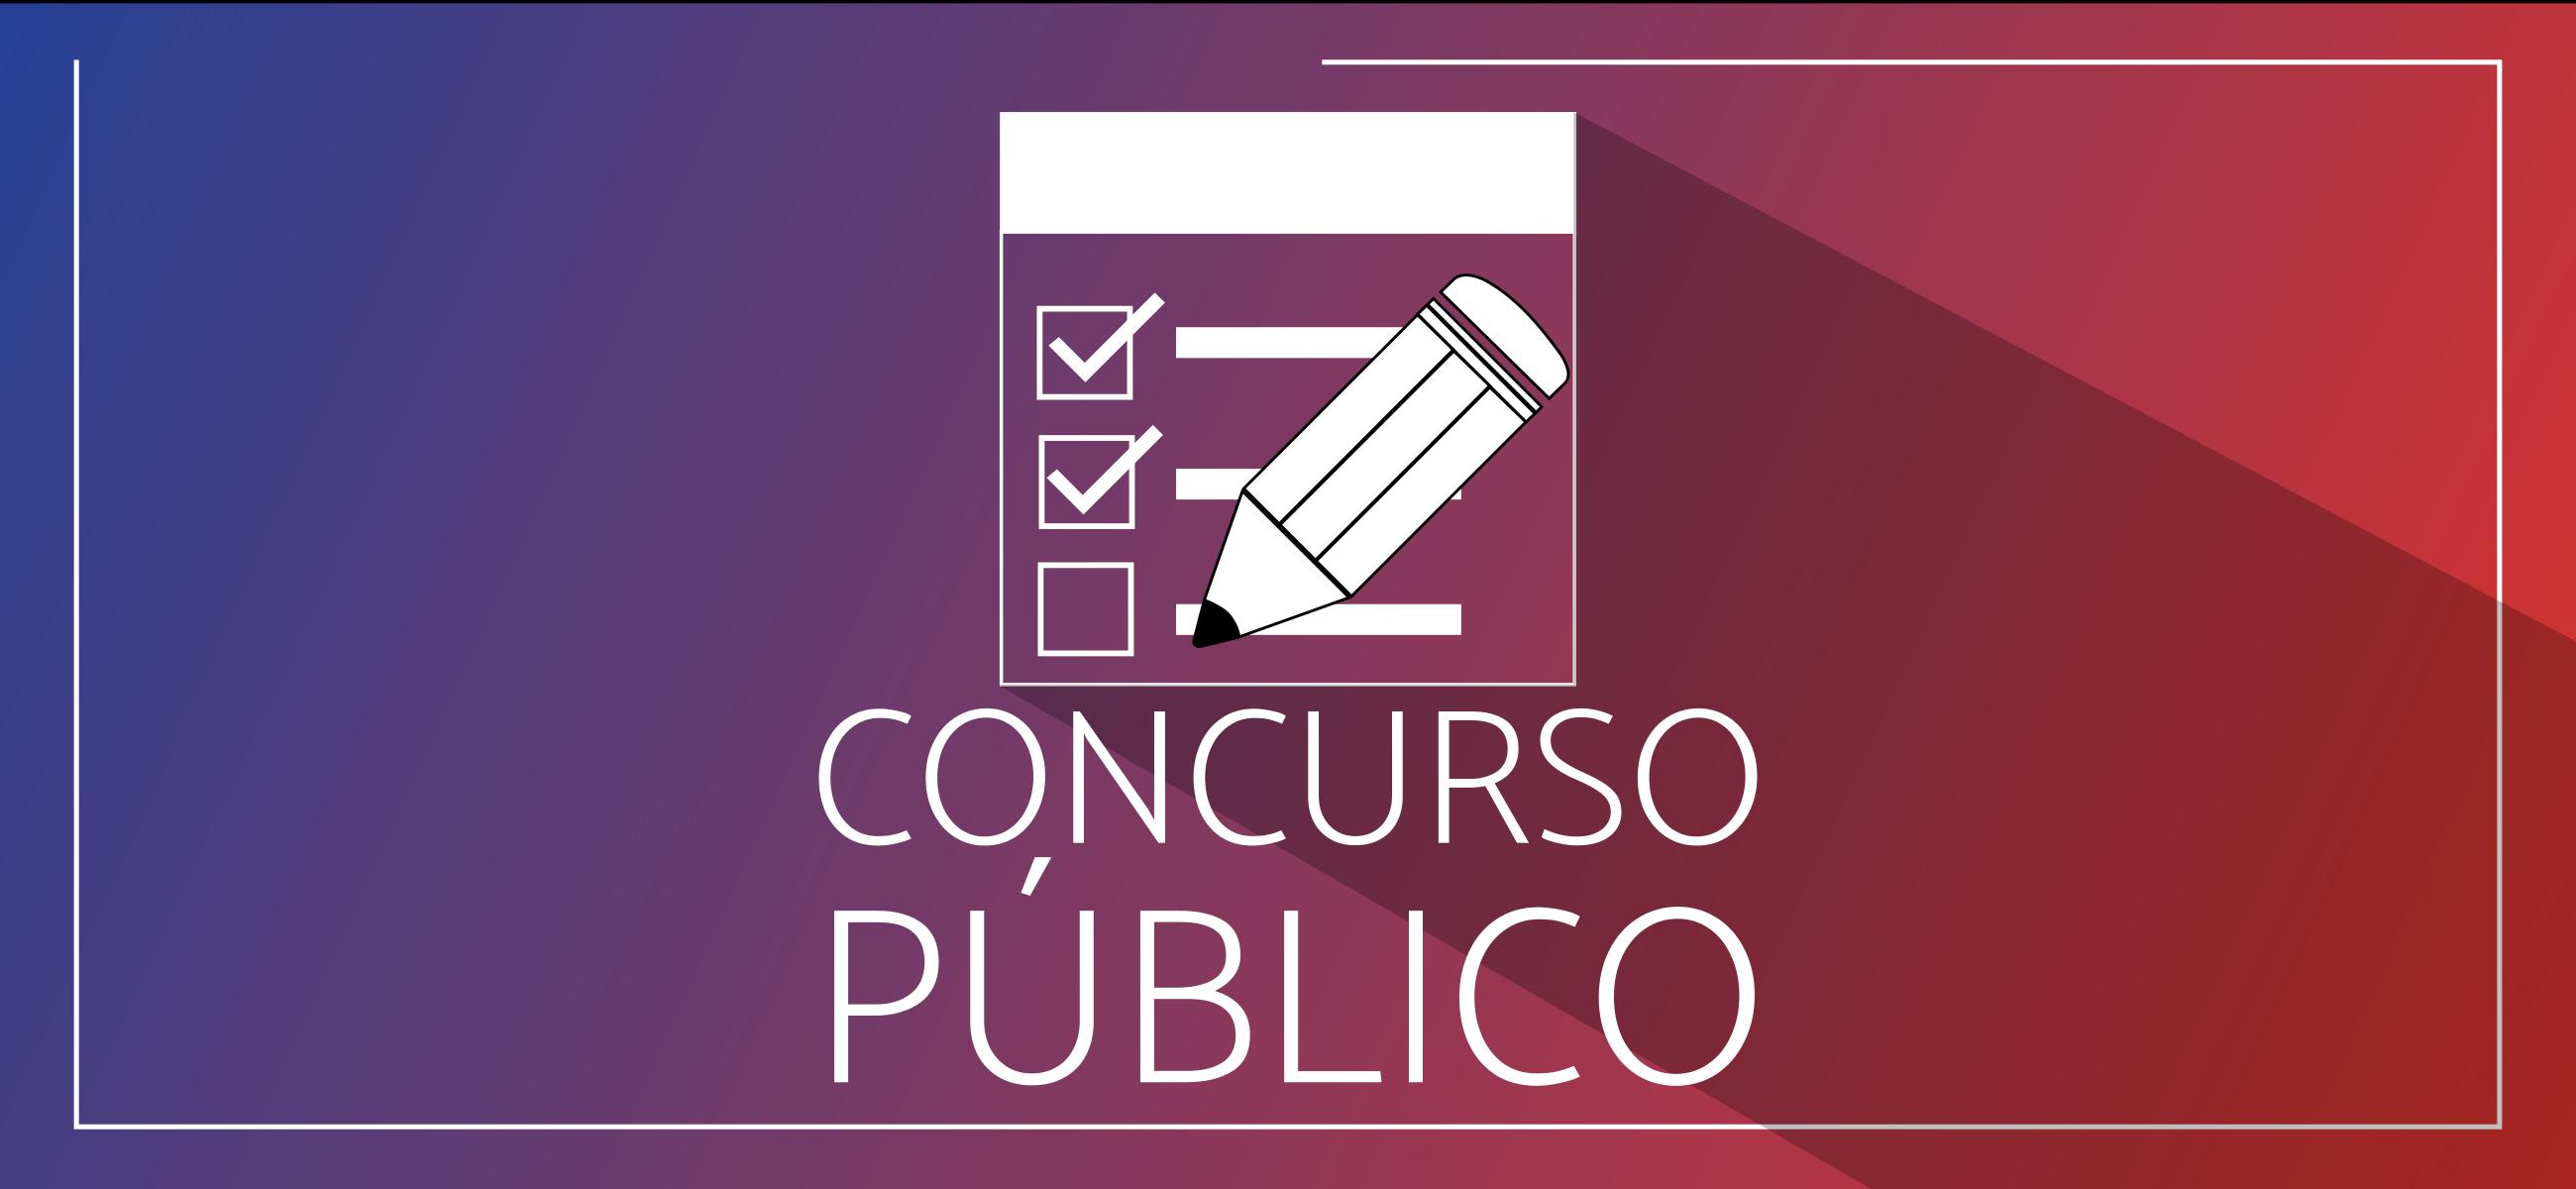 Prefeituras de Apodi e Itaú abrem edital unificado de concurso público